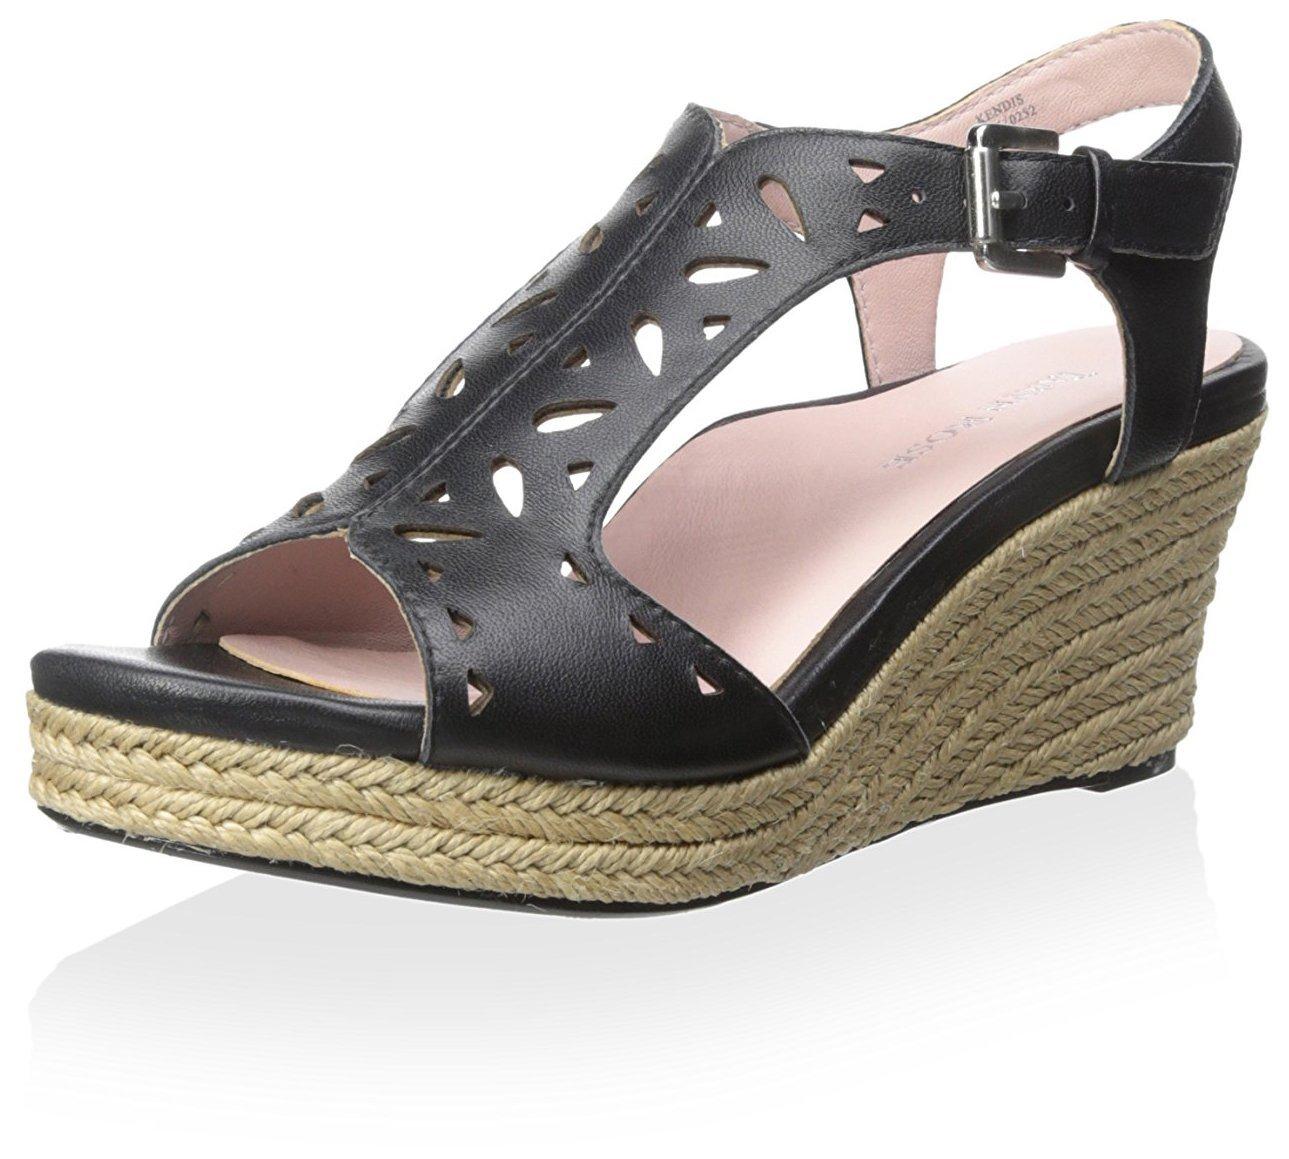 Taryn Rose Women's Kendis Sandal B00KAZVL7Q 7 B(M) US|Black